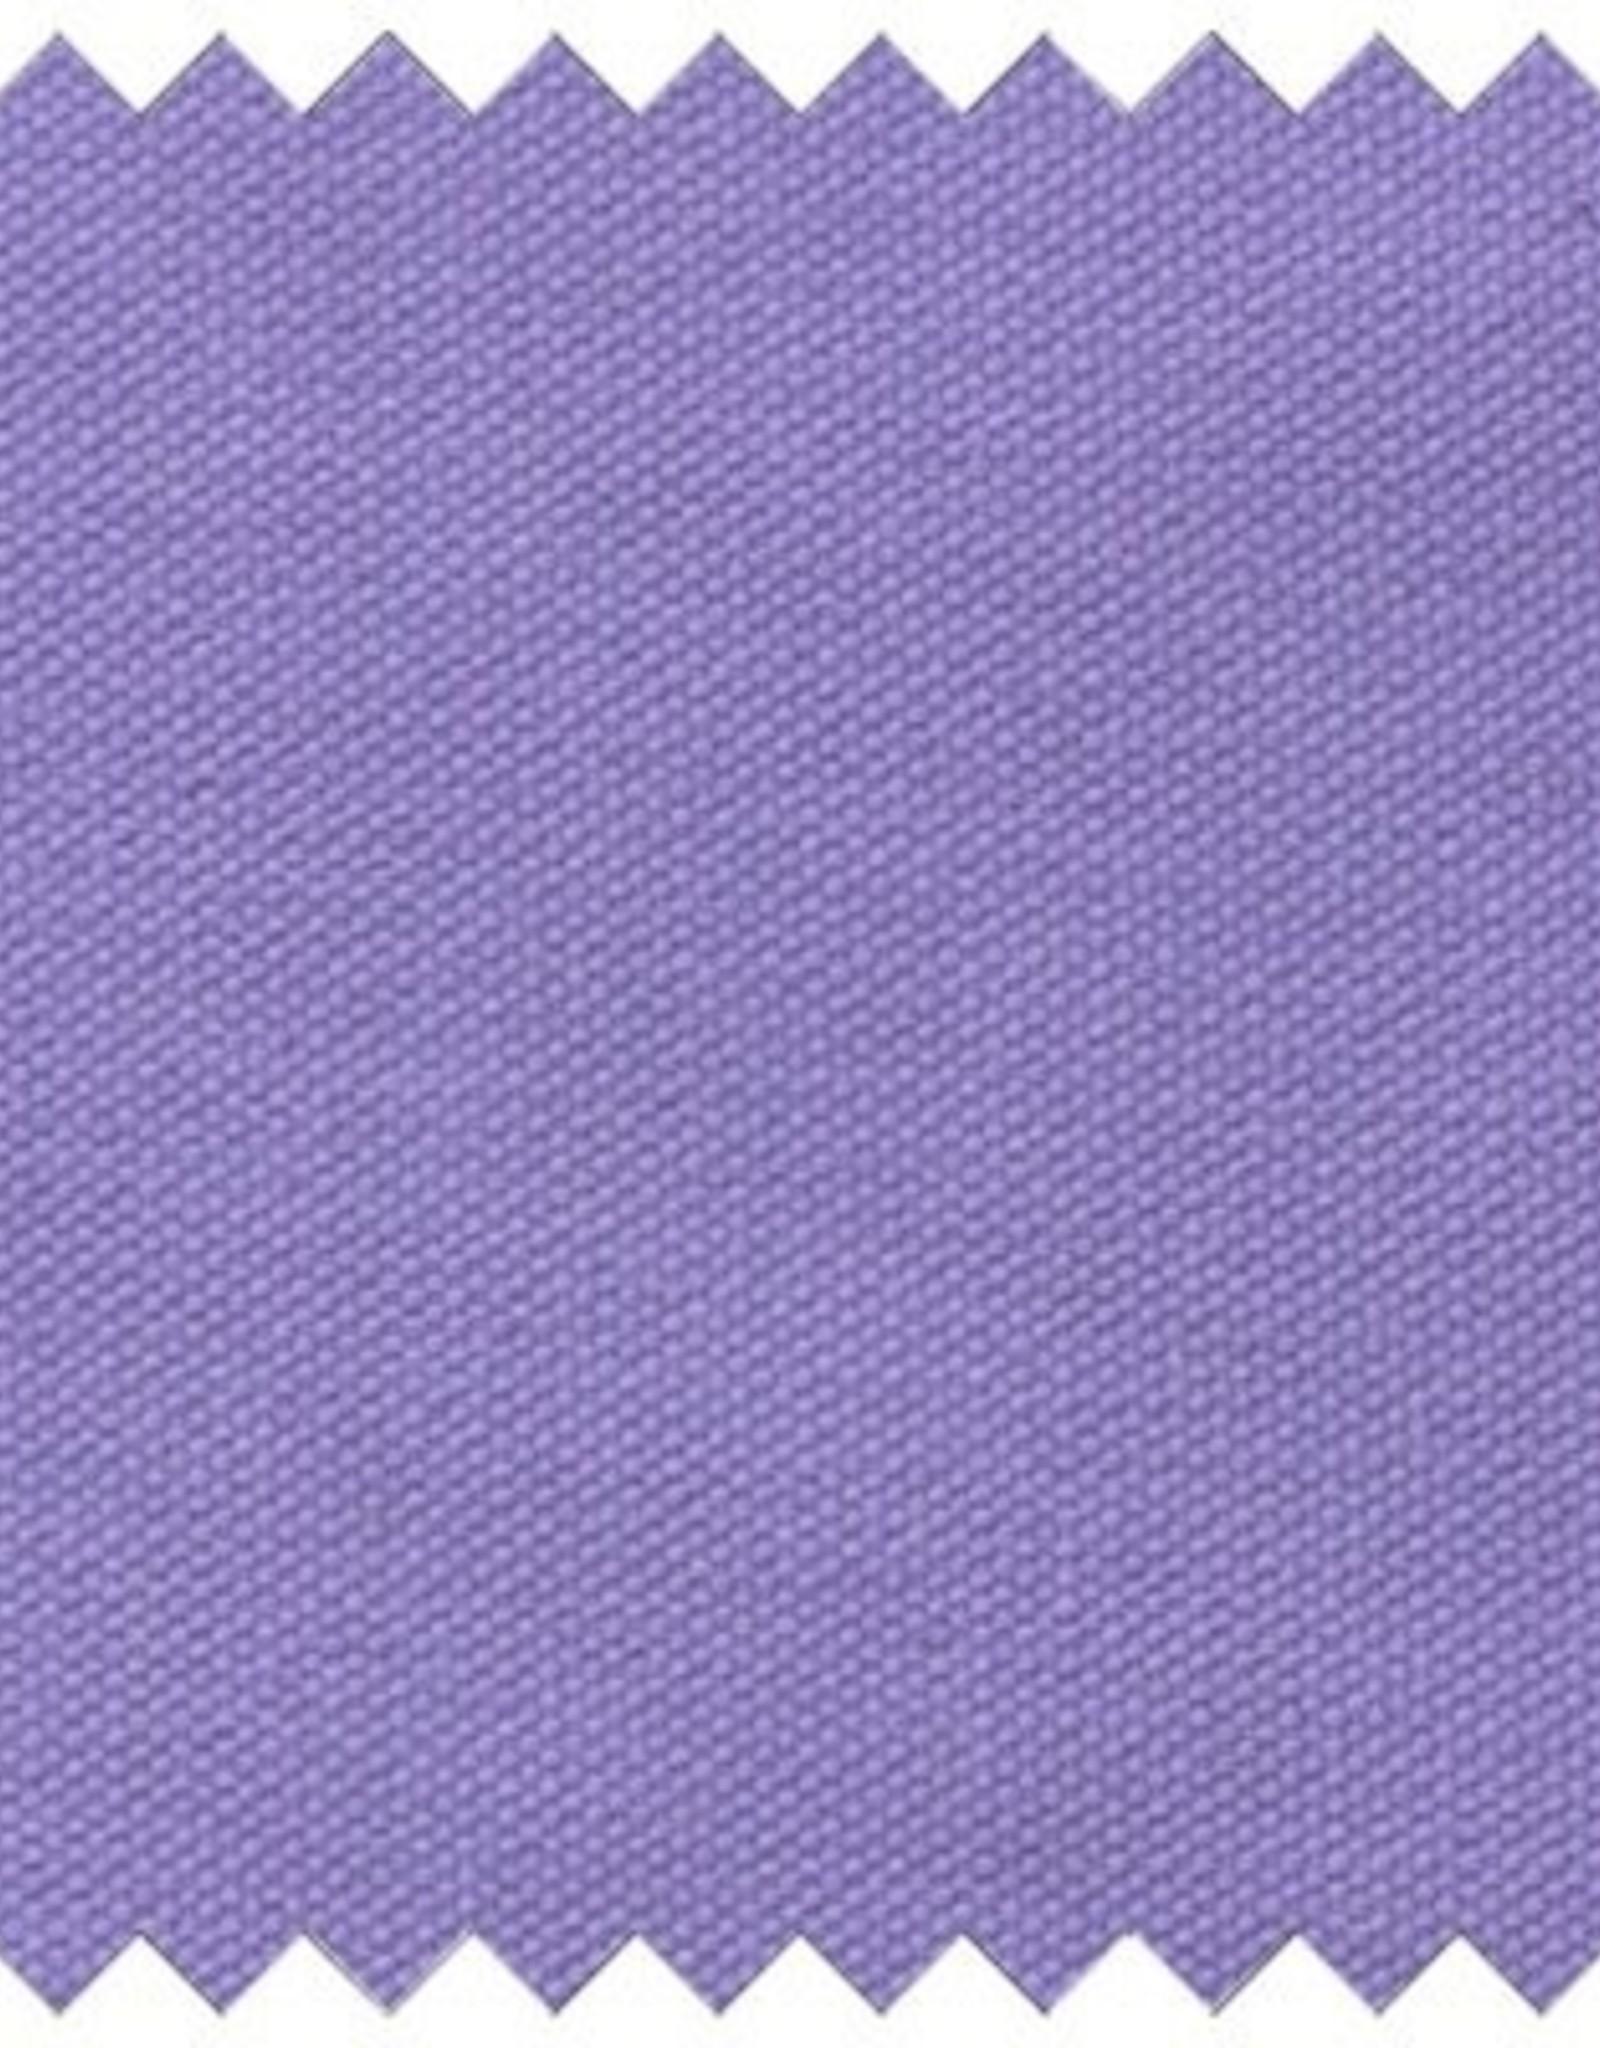 Carolina Morning Designs Buckwheat Zafu - Organic Lavender